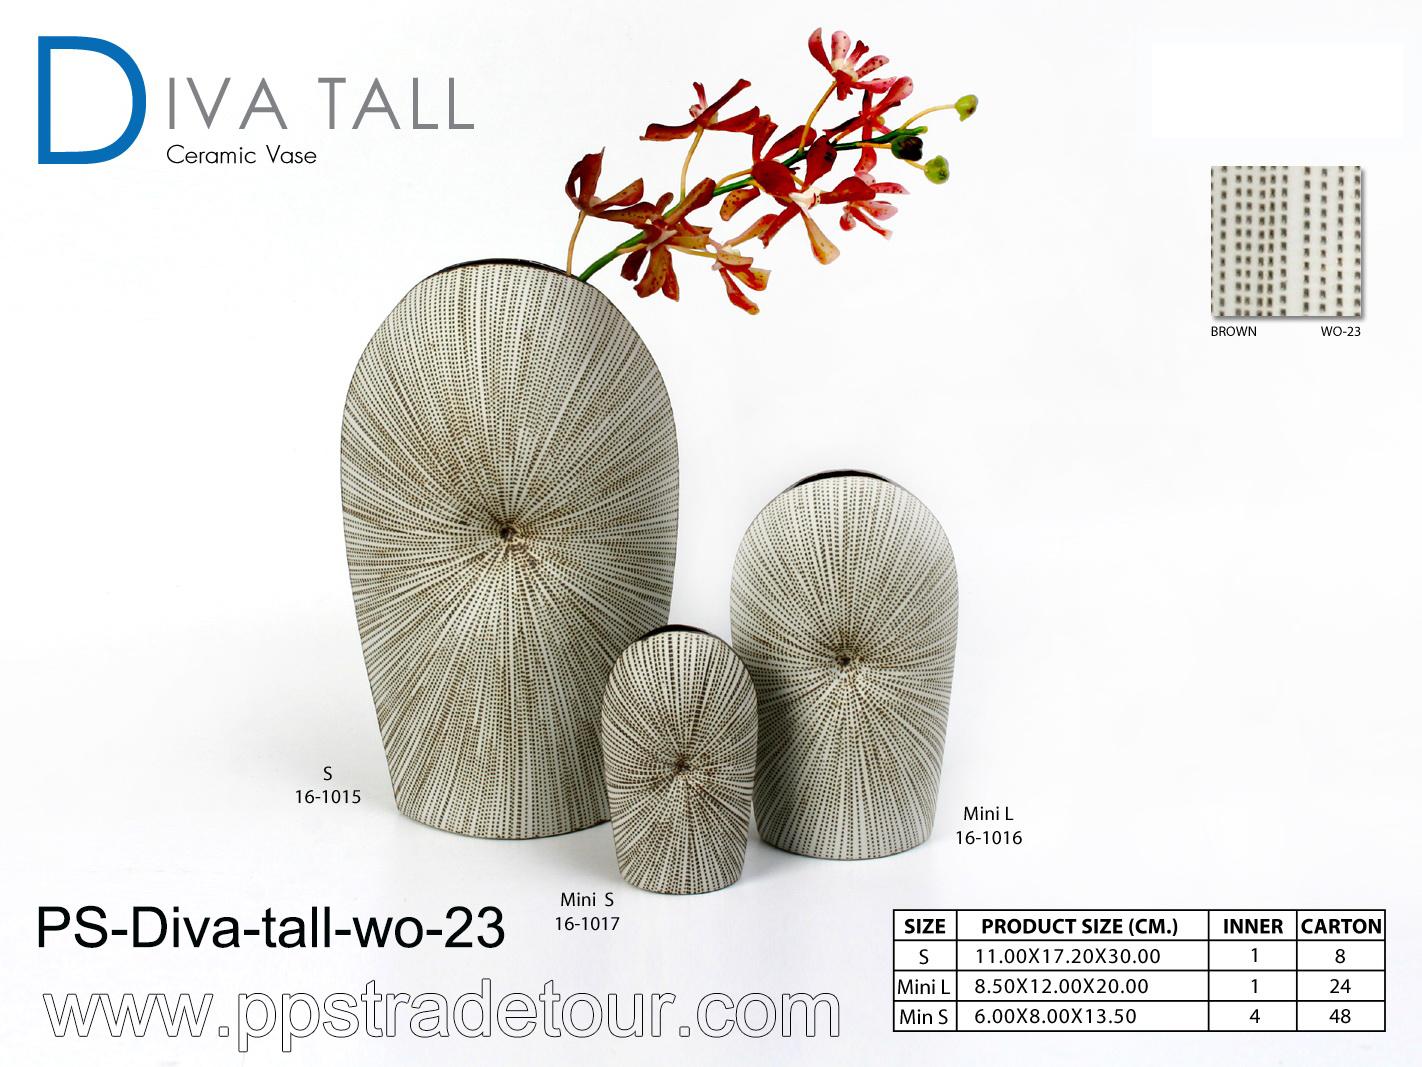 PSCV-Diva-Tall_wo-23